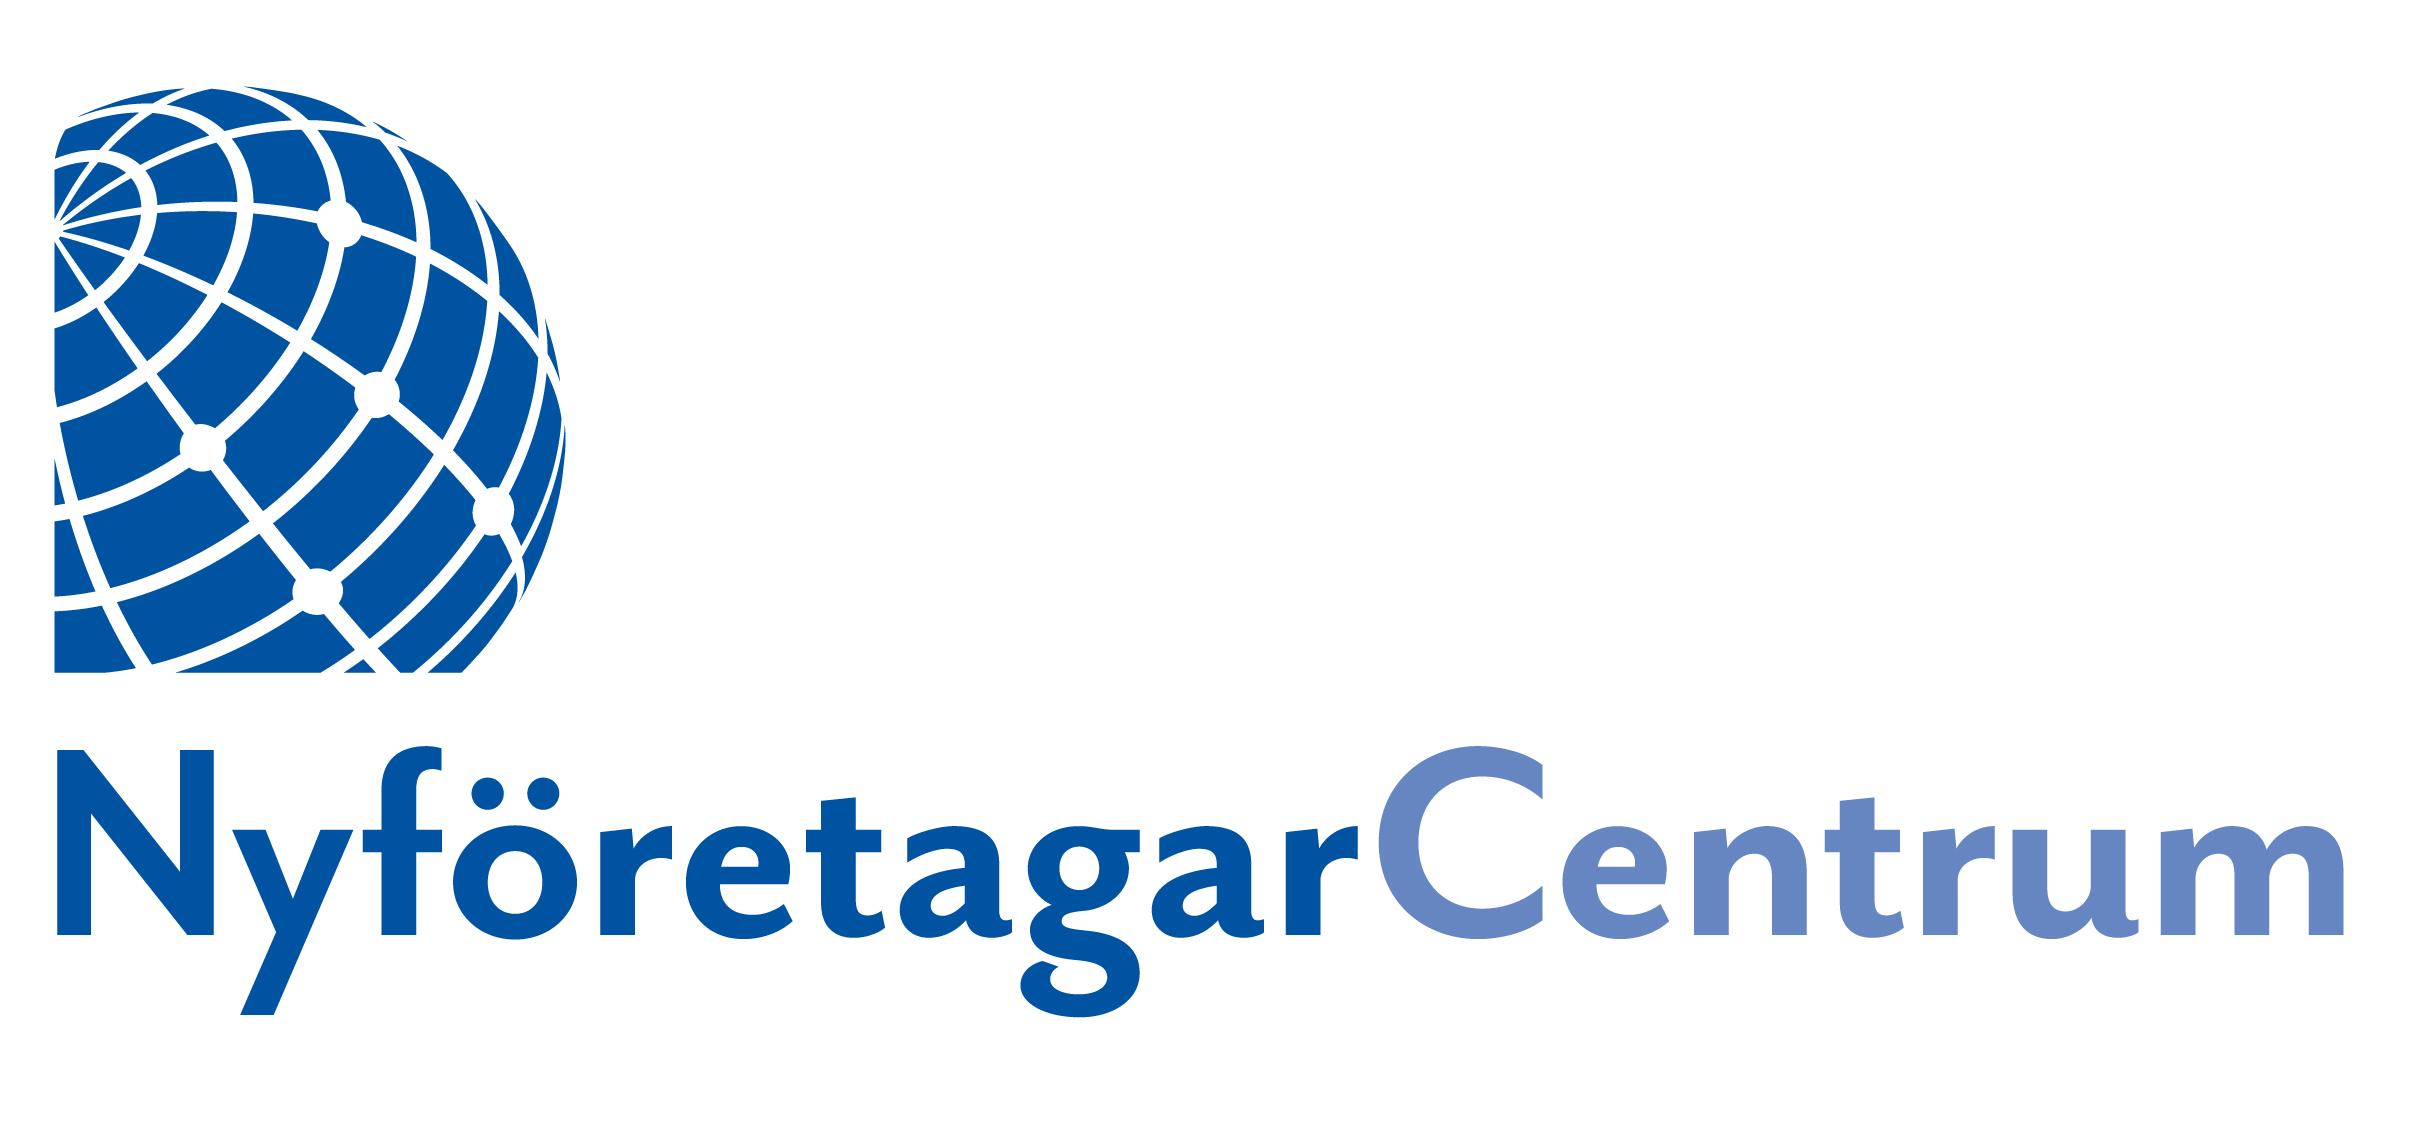 nyföretagarcentrum logo.jpeg